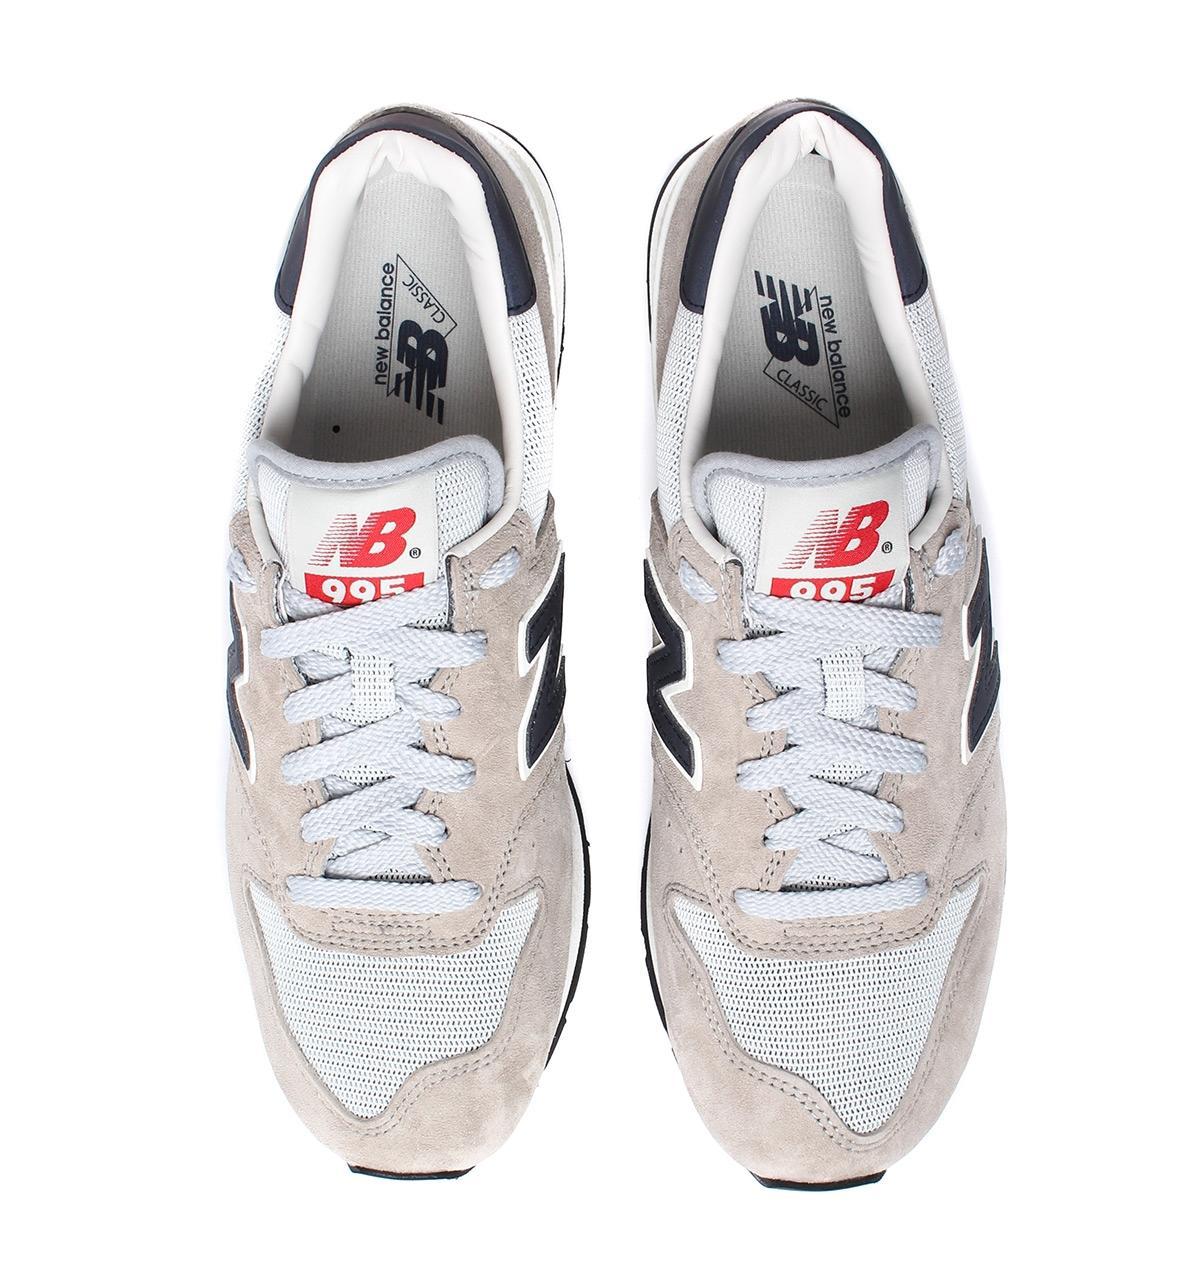 new balance 995 trainers